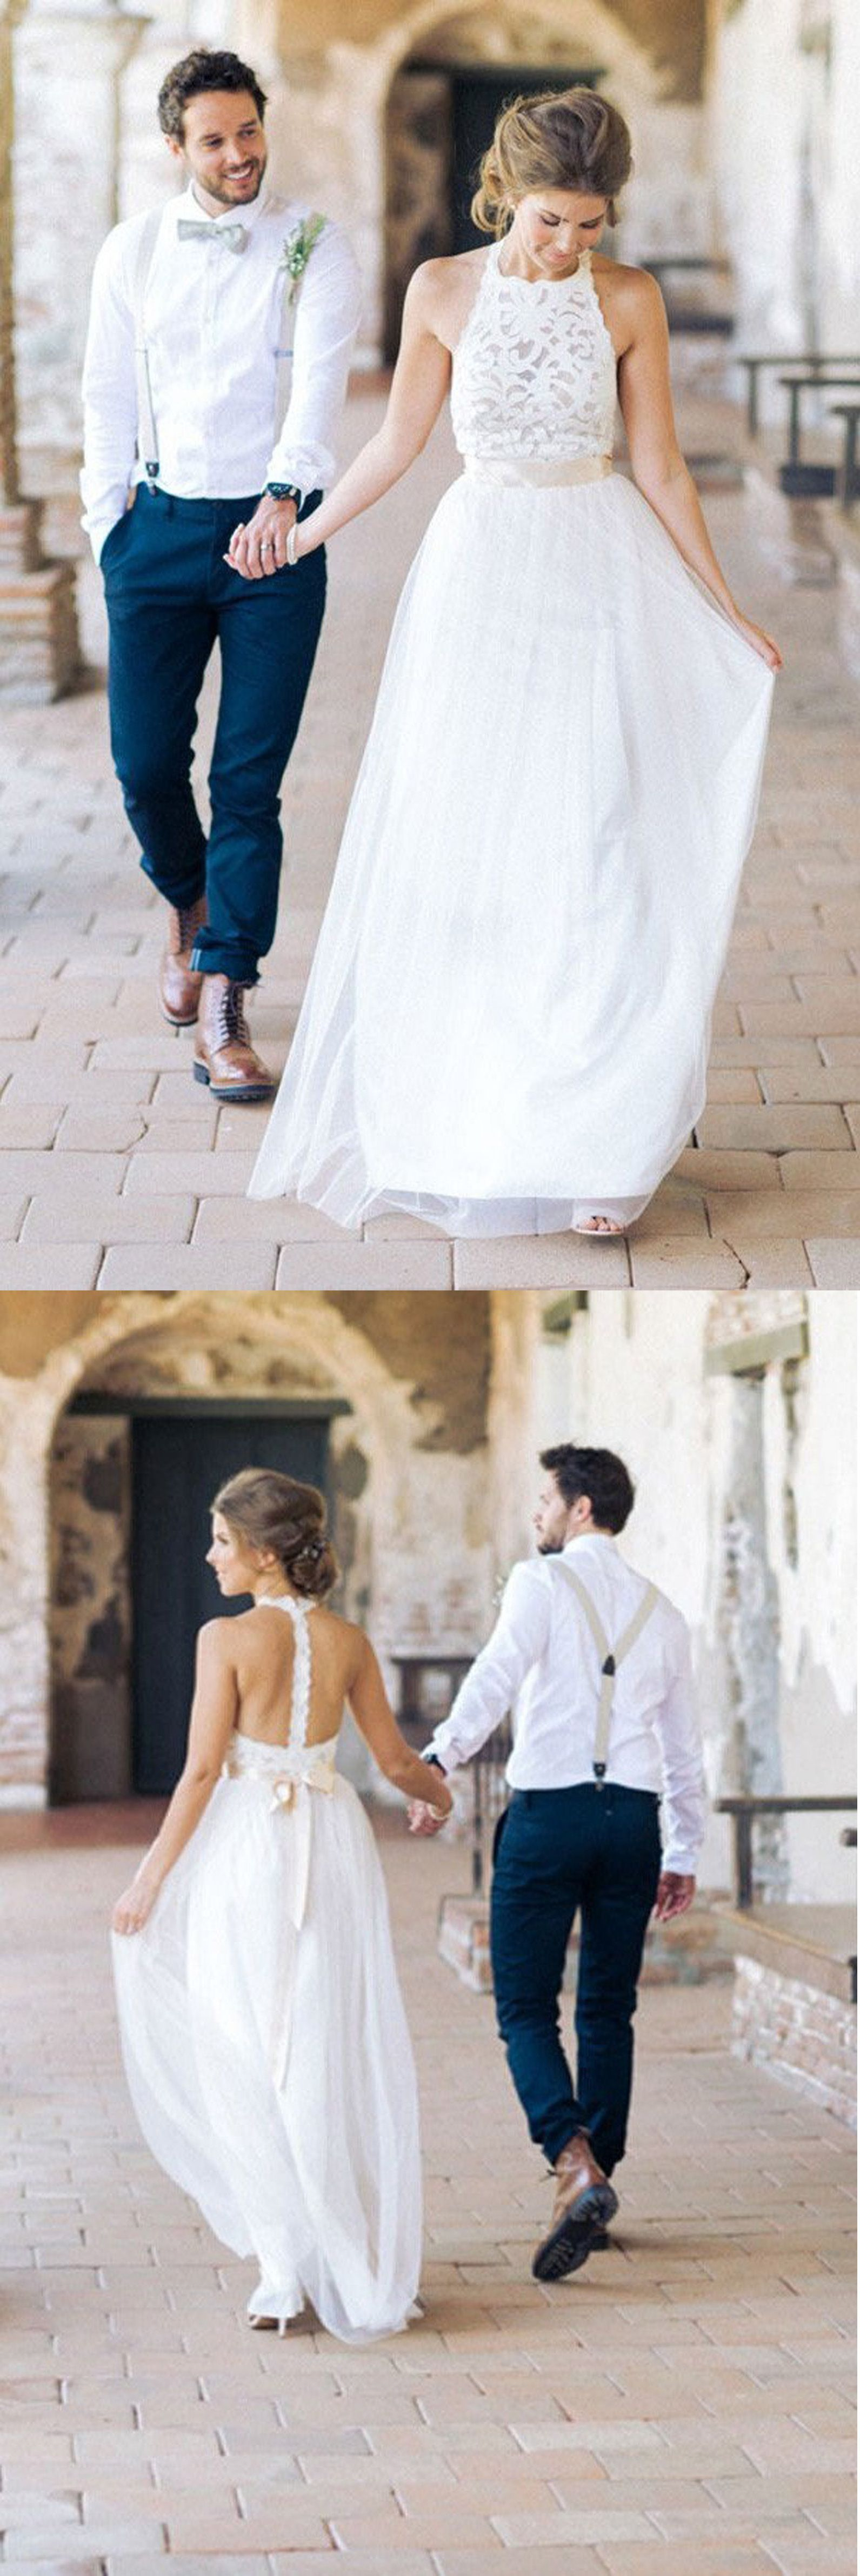 Simple Jewel Sleeveless Wedding Dress Chiffon Lace Top Wedding